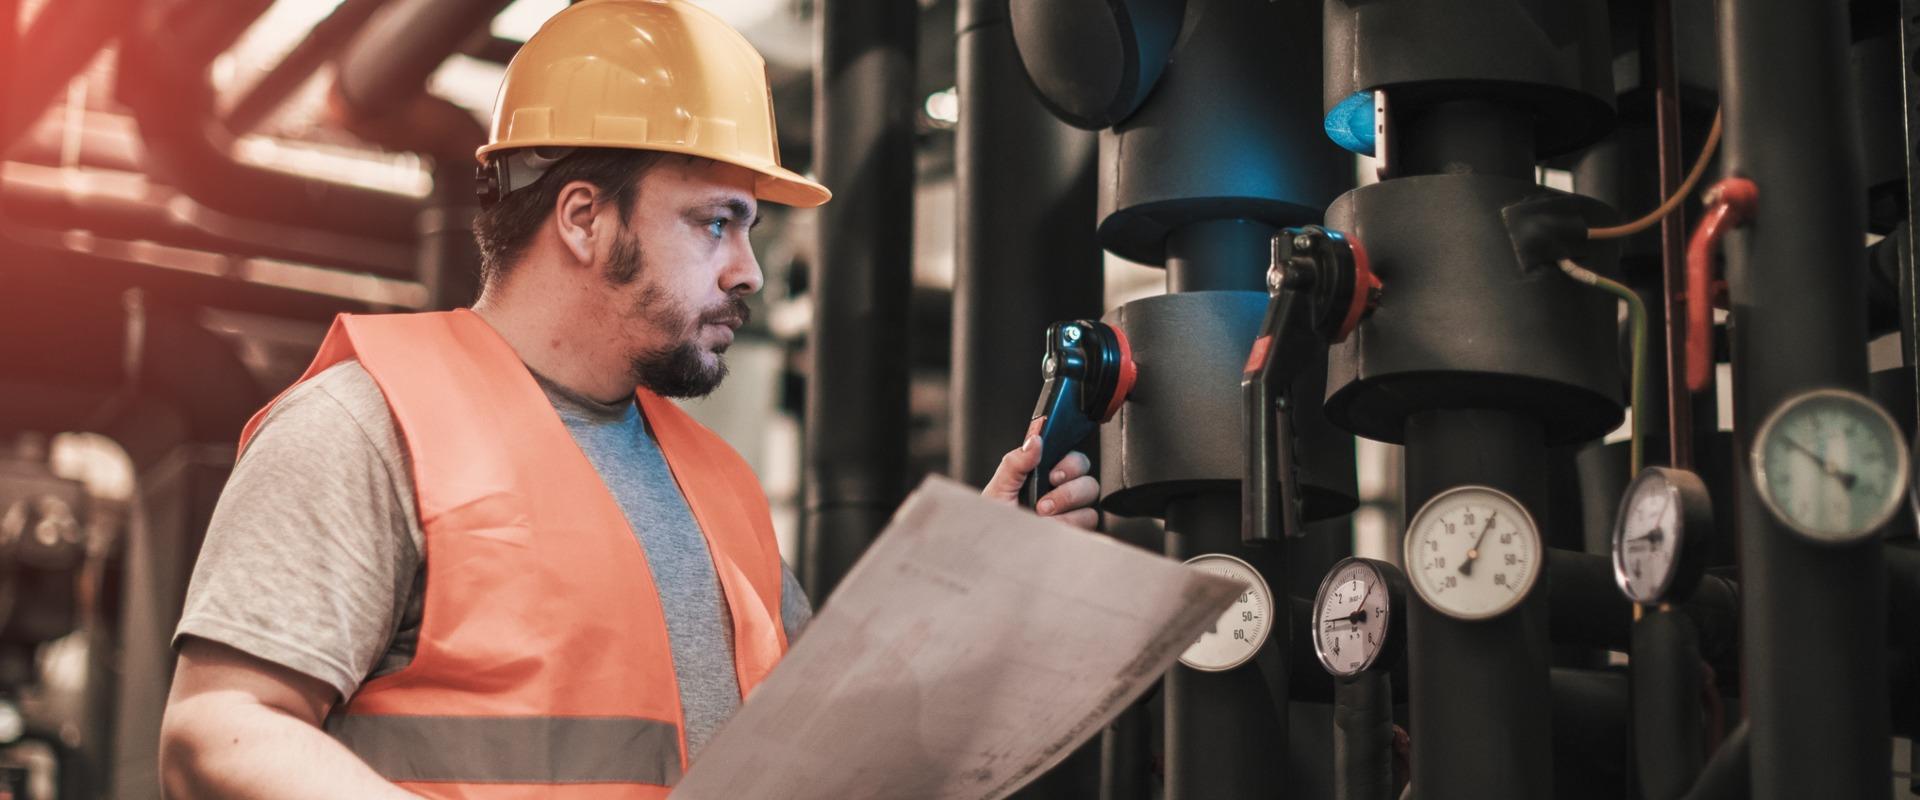 Boiler technician checking gauges